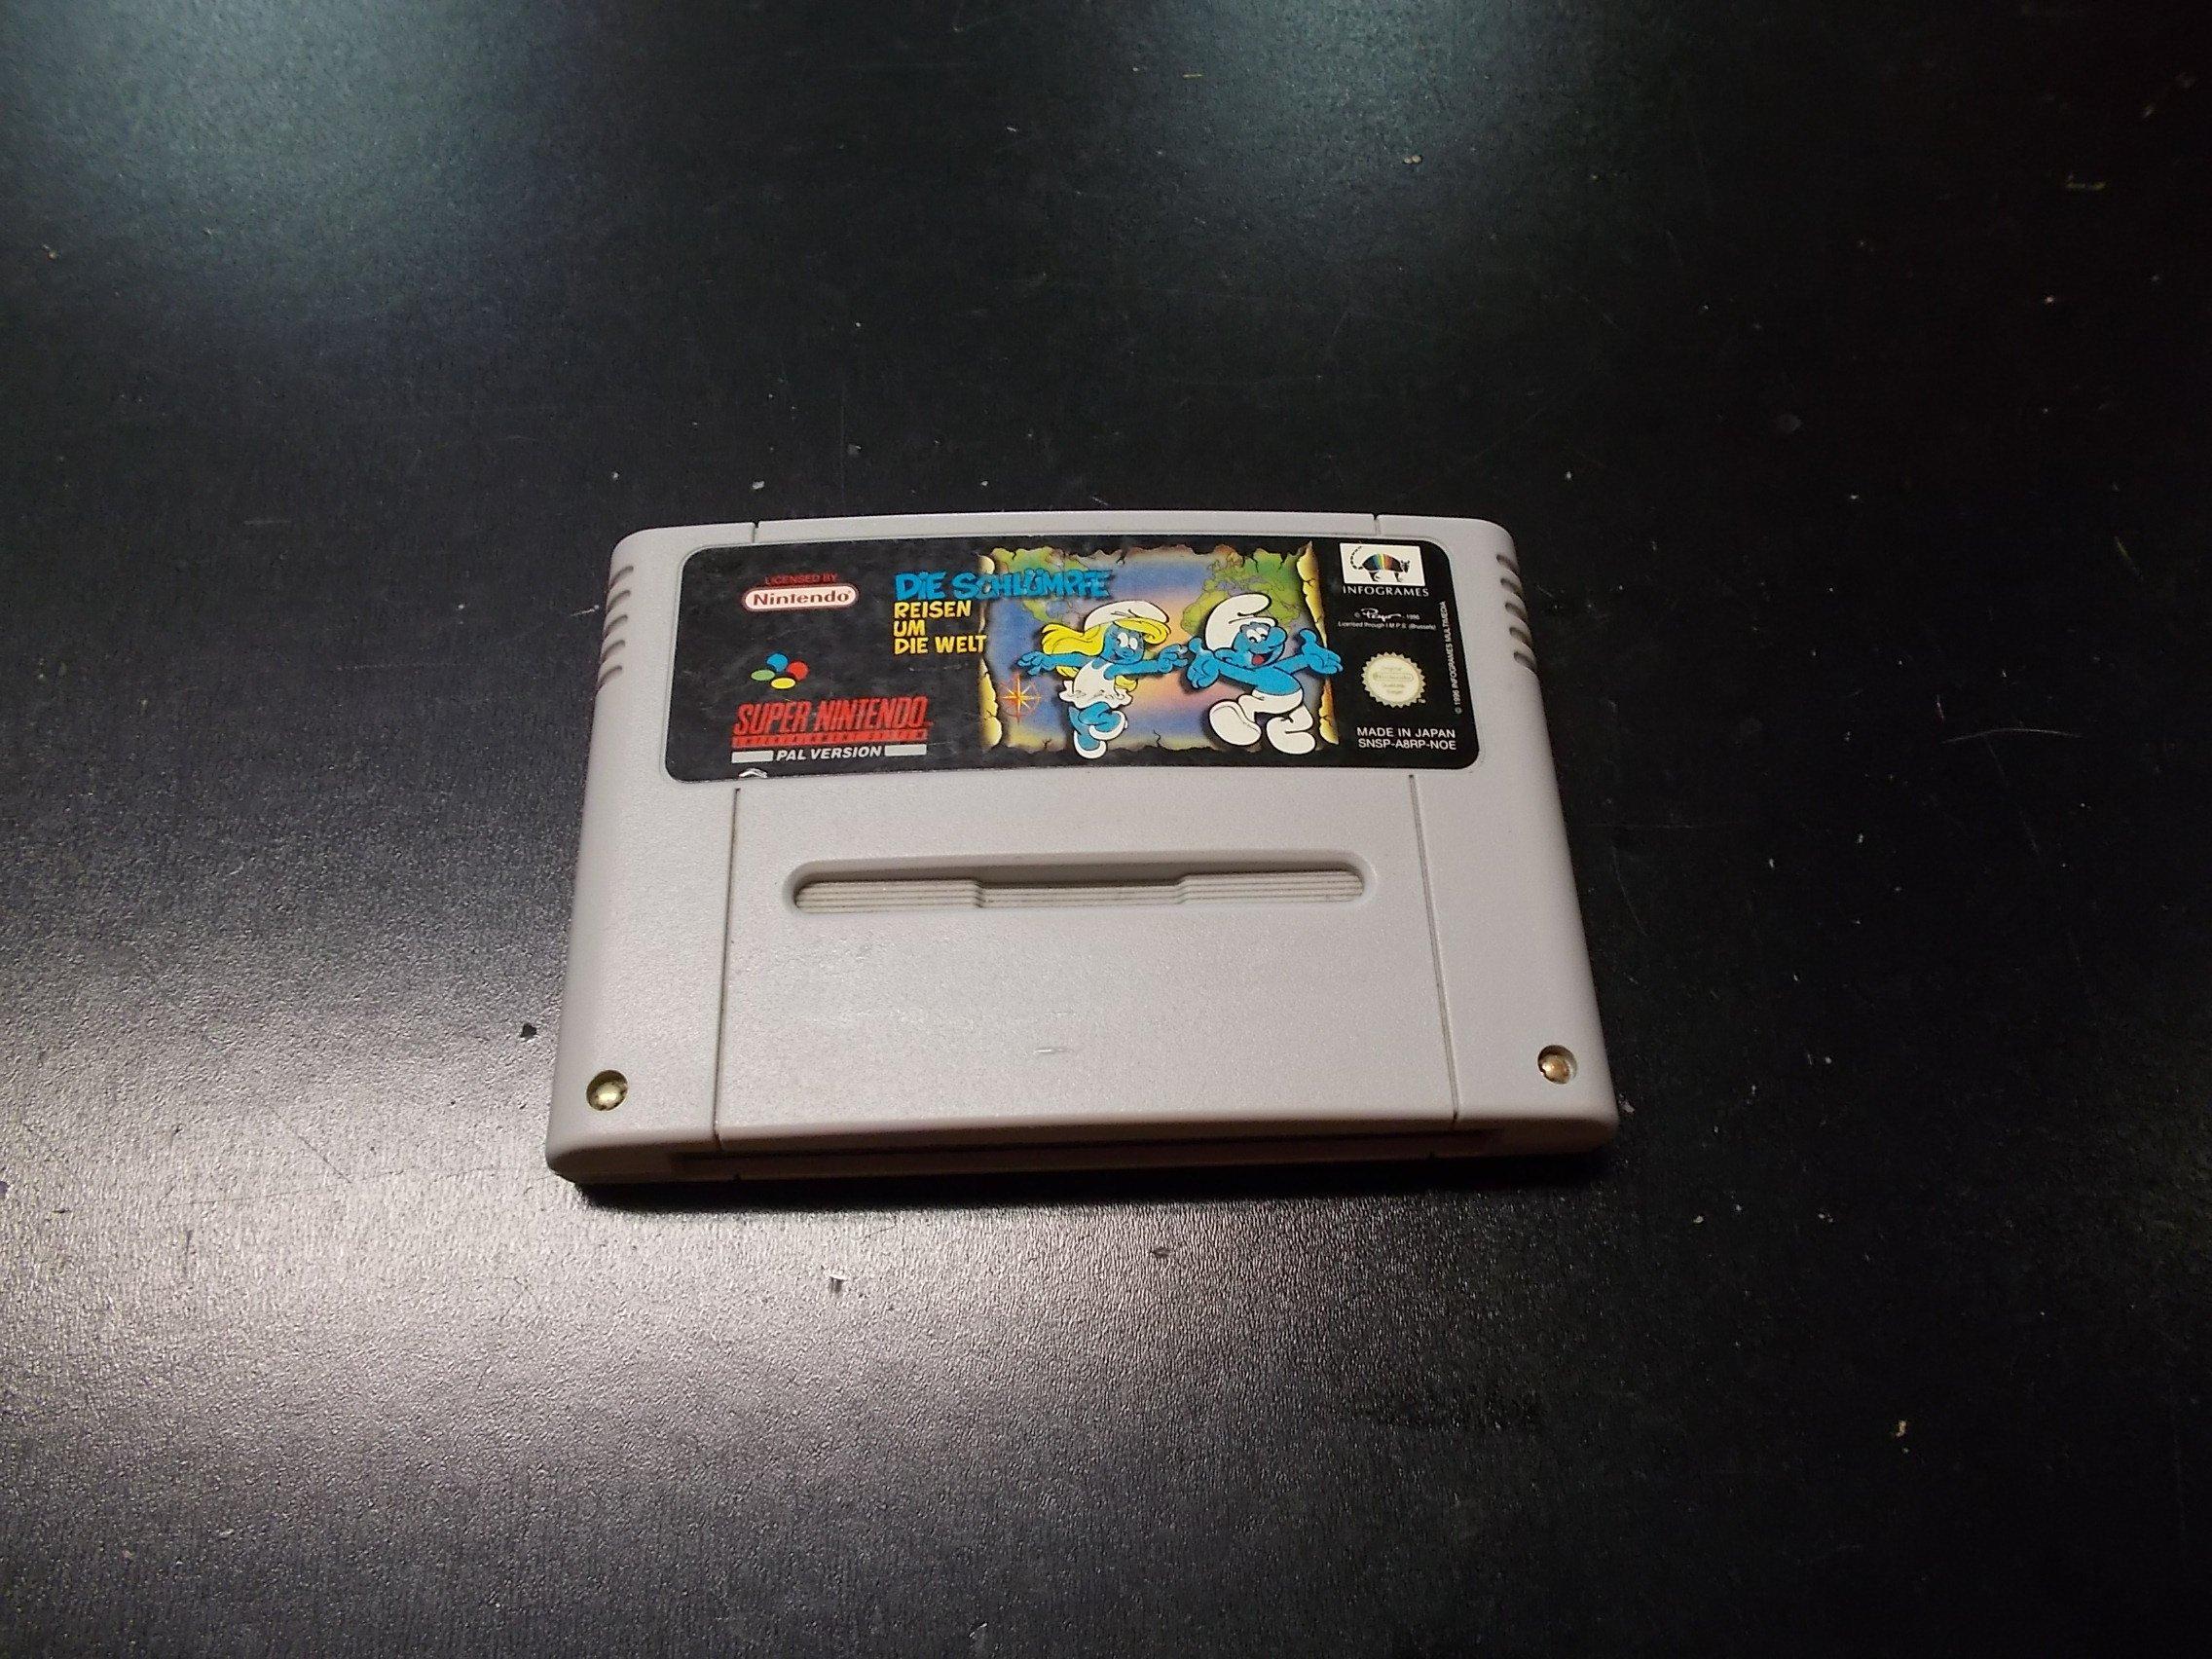 DIE SCHLUMPFE (SMERFY) - GRA Nintendo SNES Opole 0228